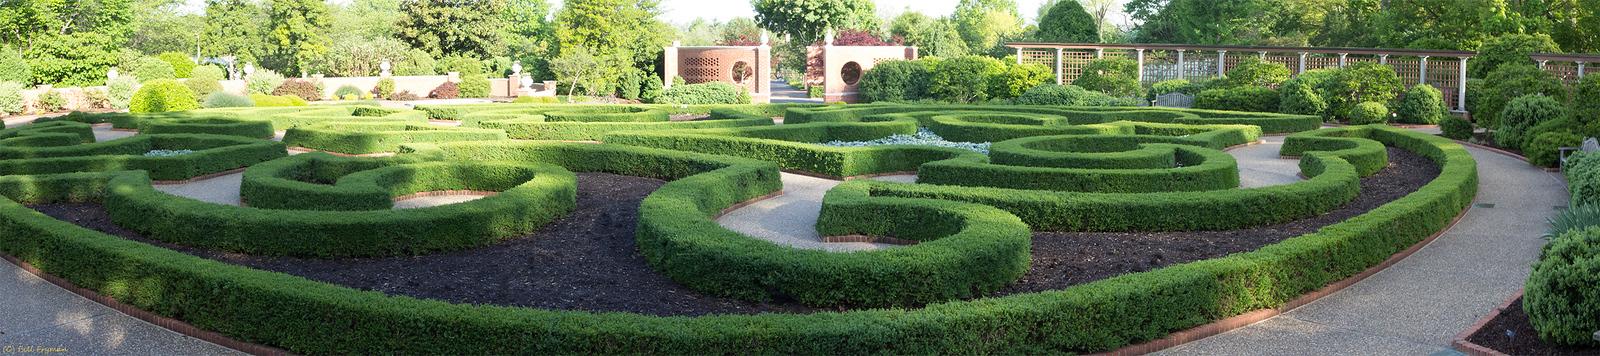 Missouri Botanical Garden 2012-04-21